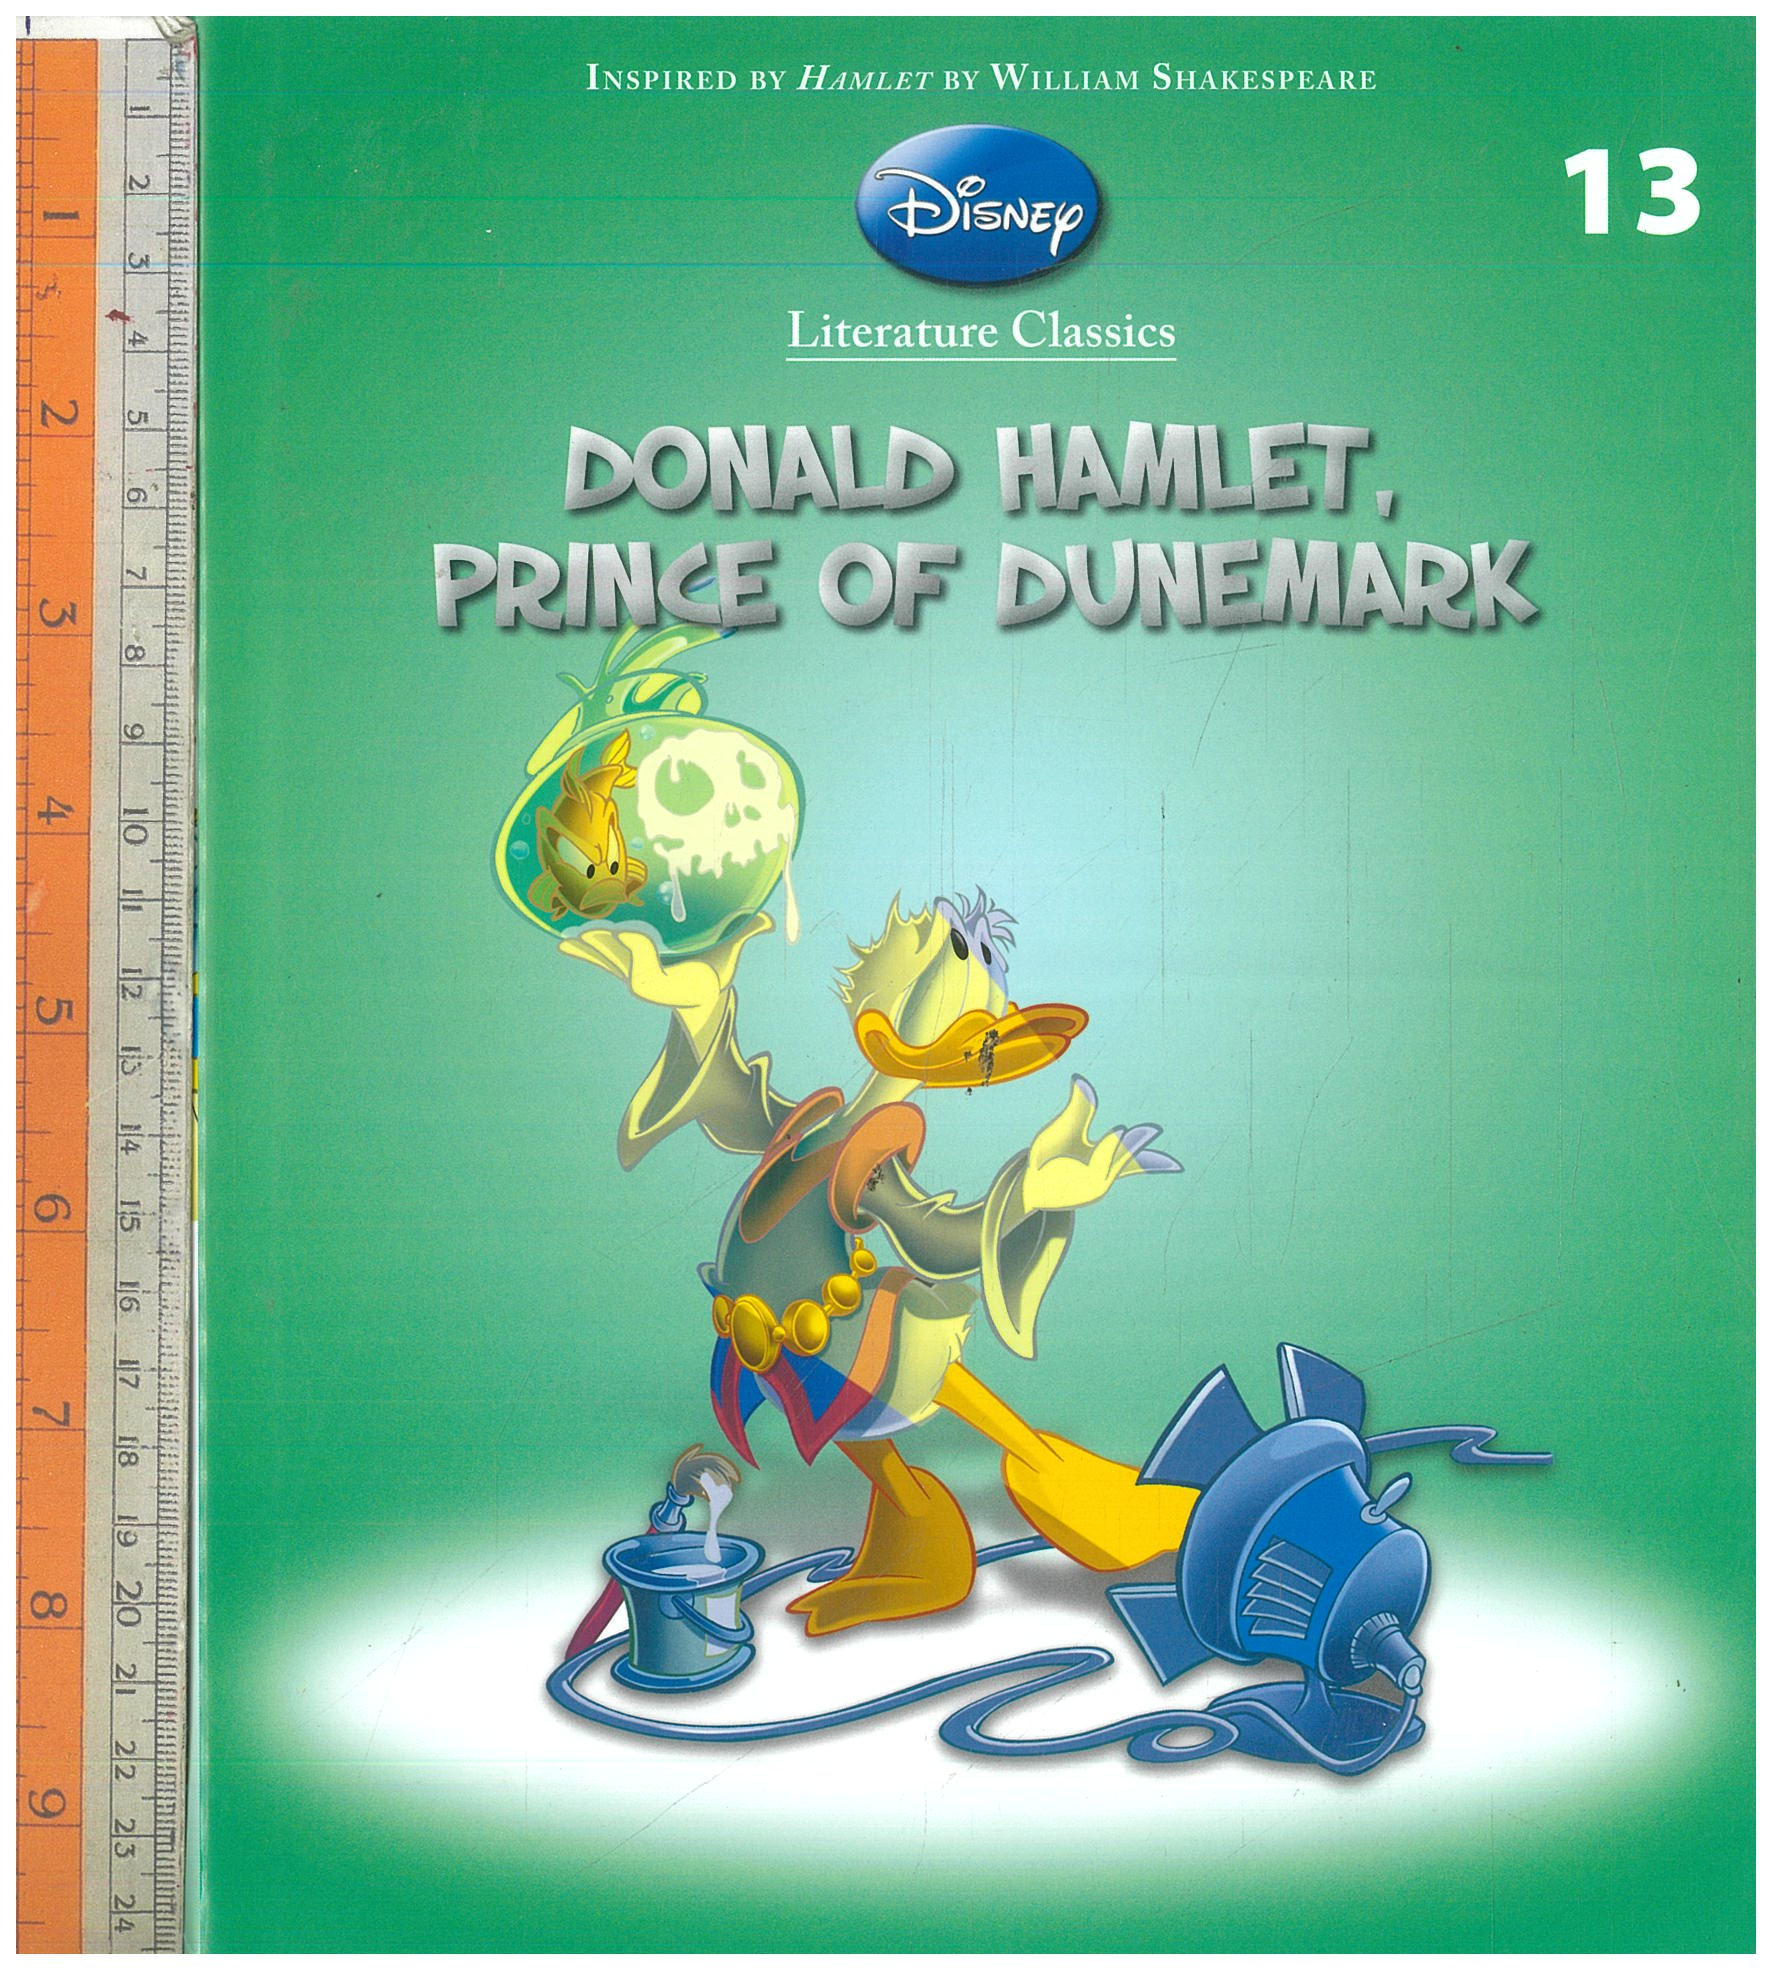 Donald Hamlet,Prince